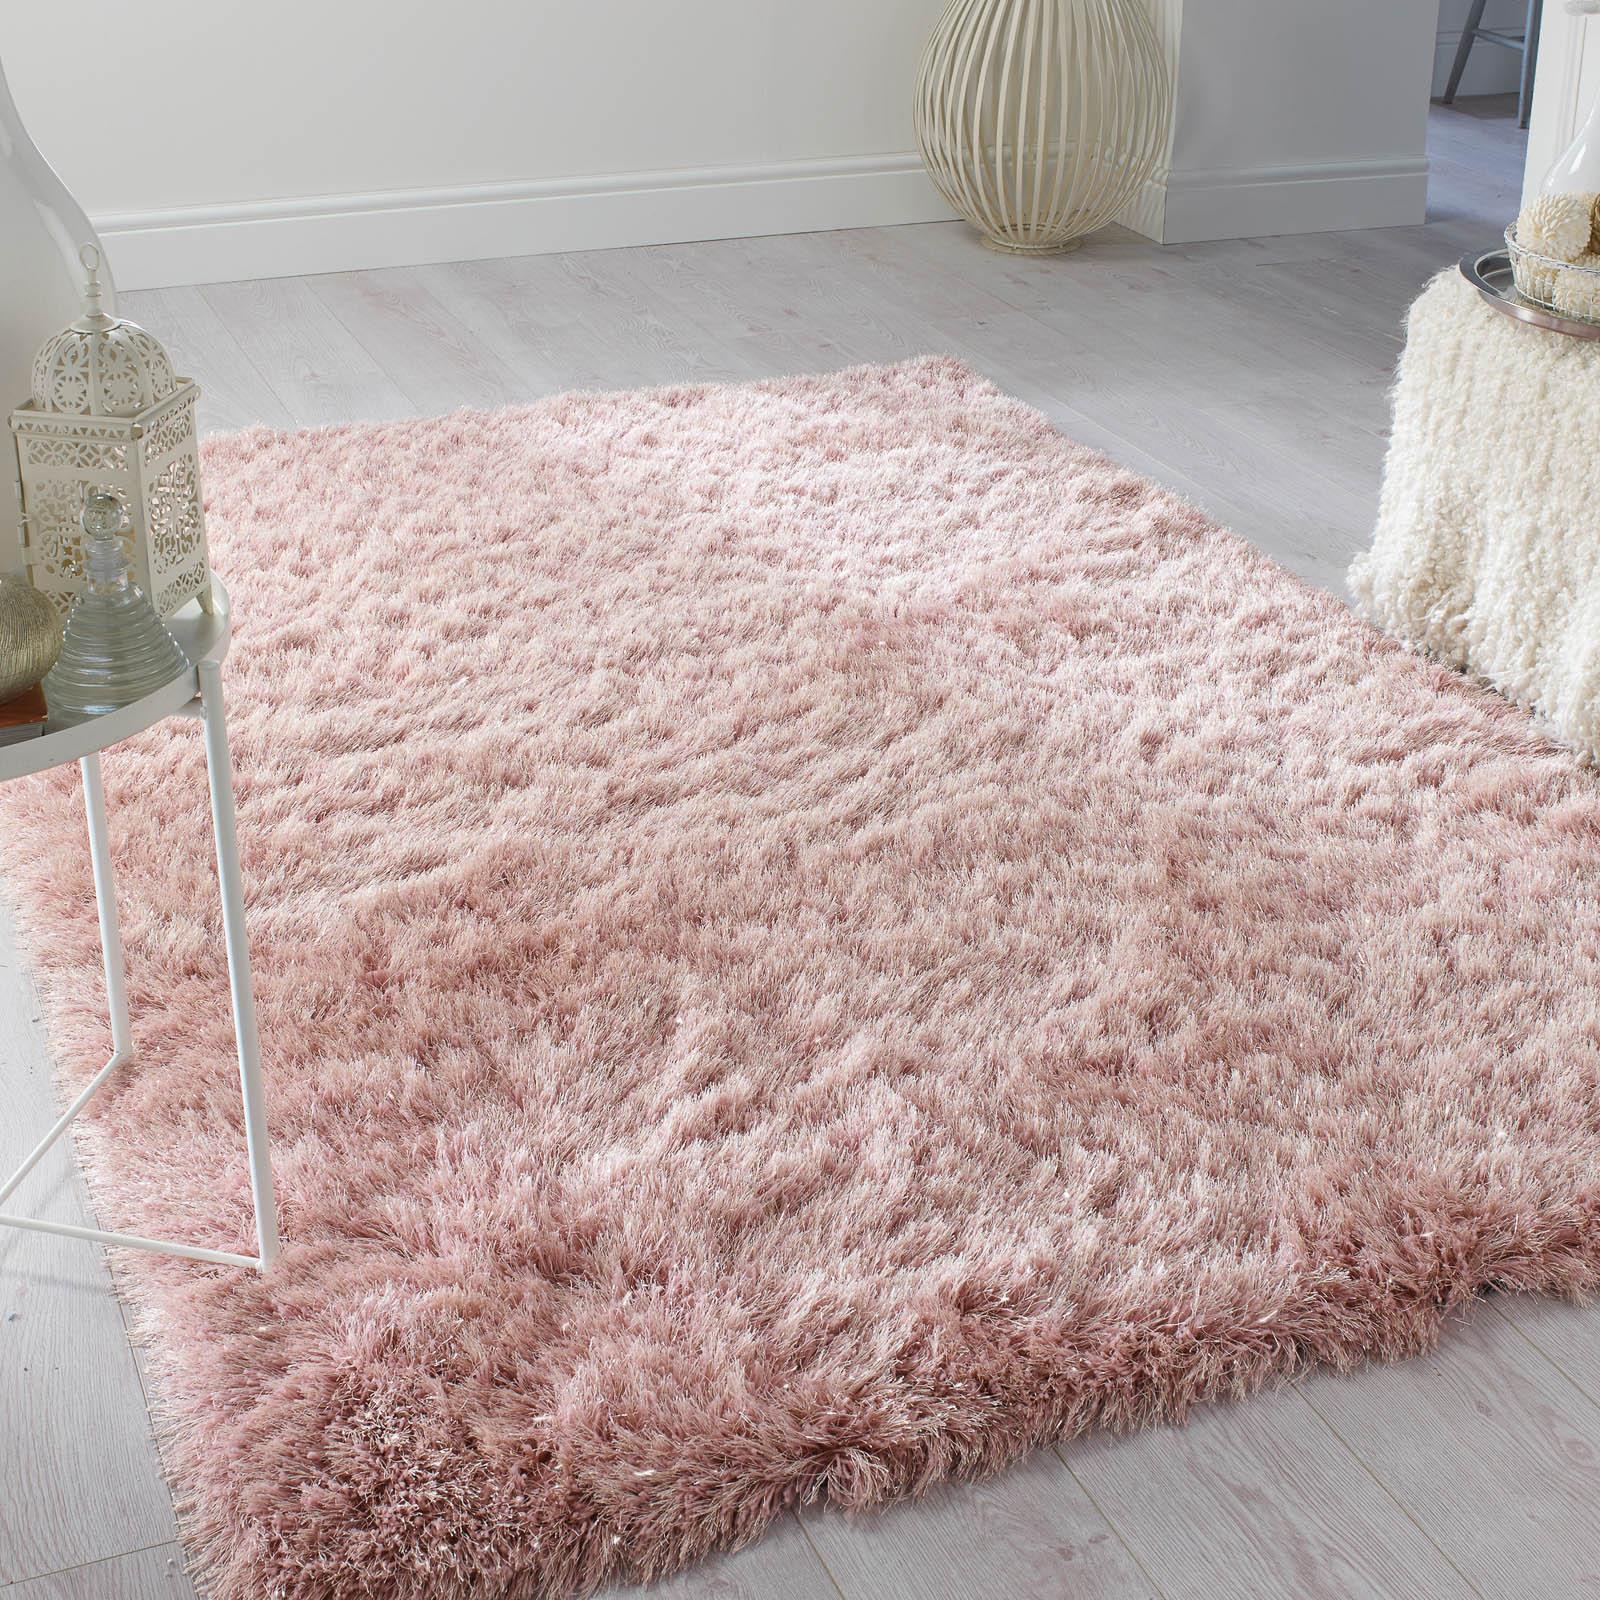 Captivating pink rug